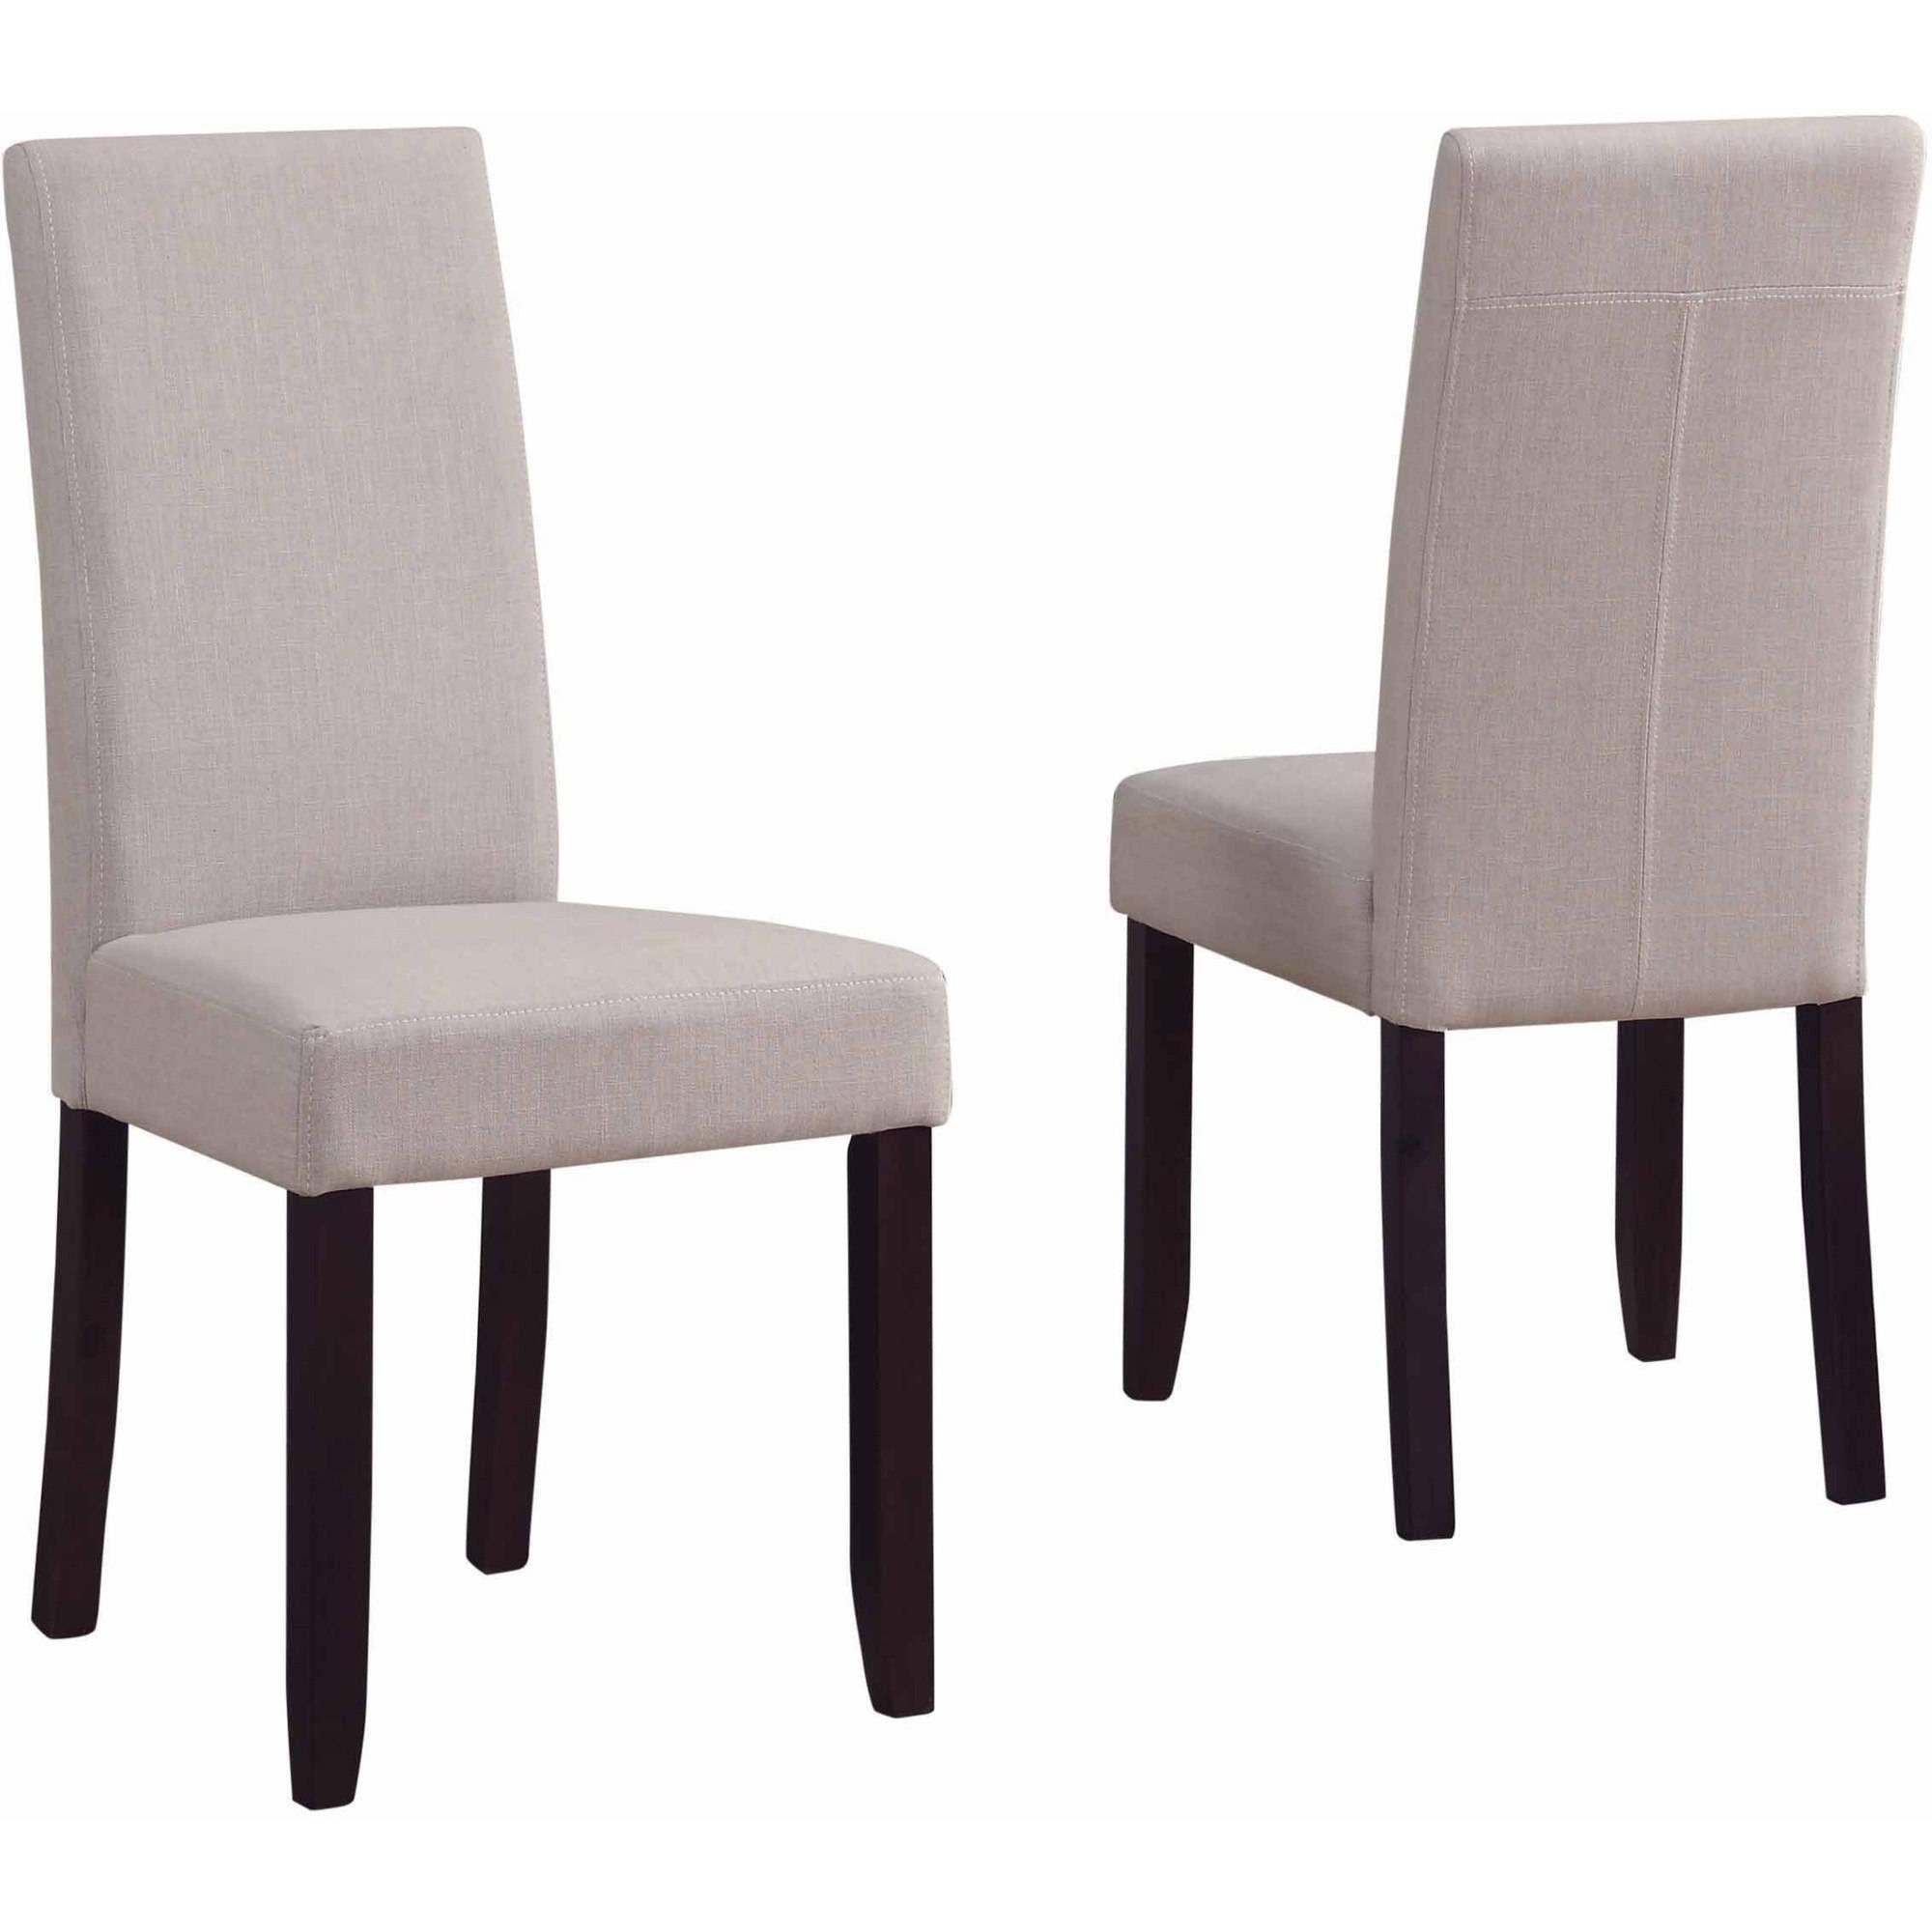 Brooklyn + Max Brunswick Parson Dining Chairs, Set of 2 - Walmart.com